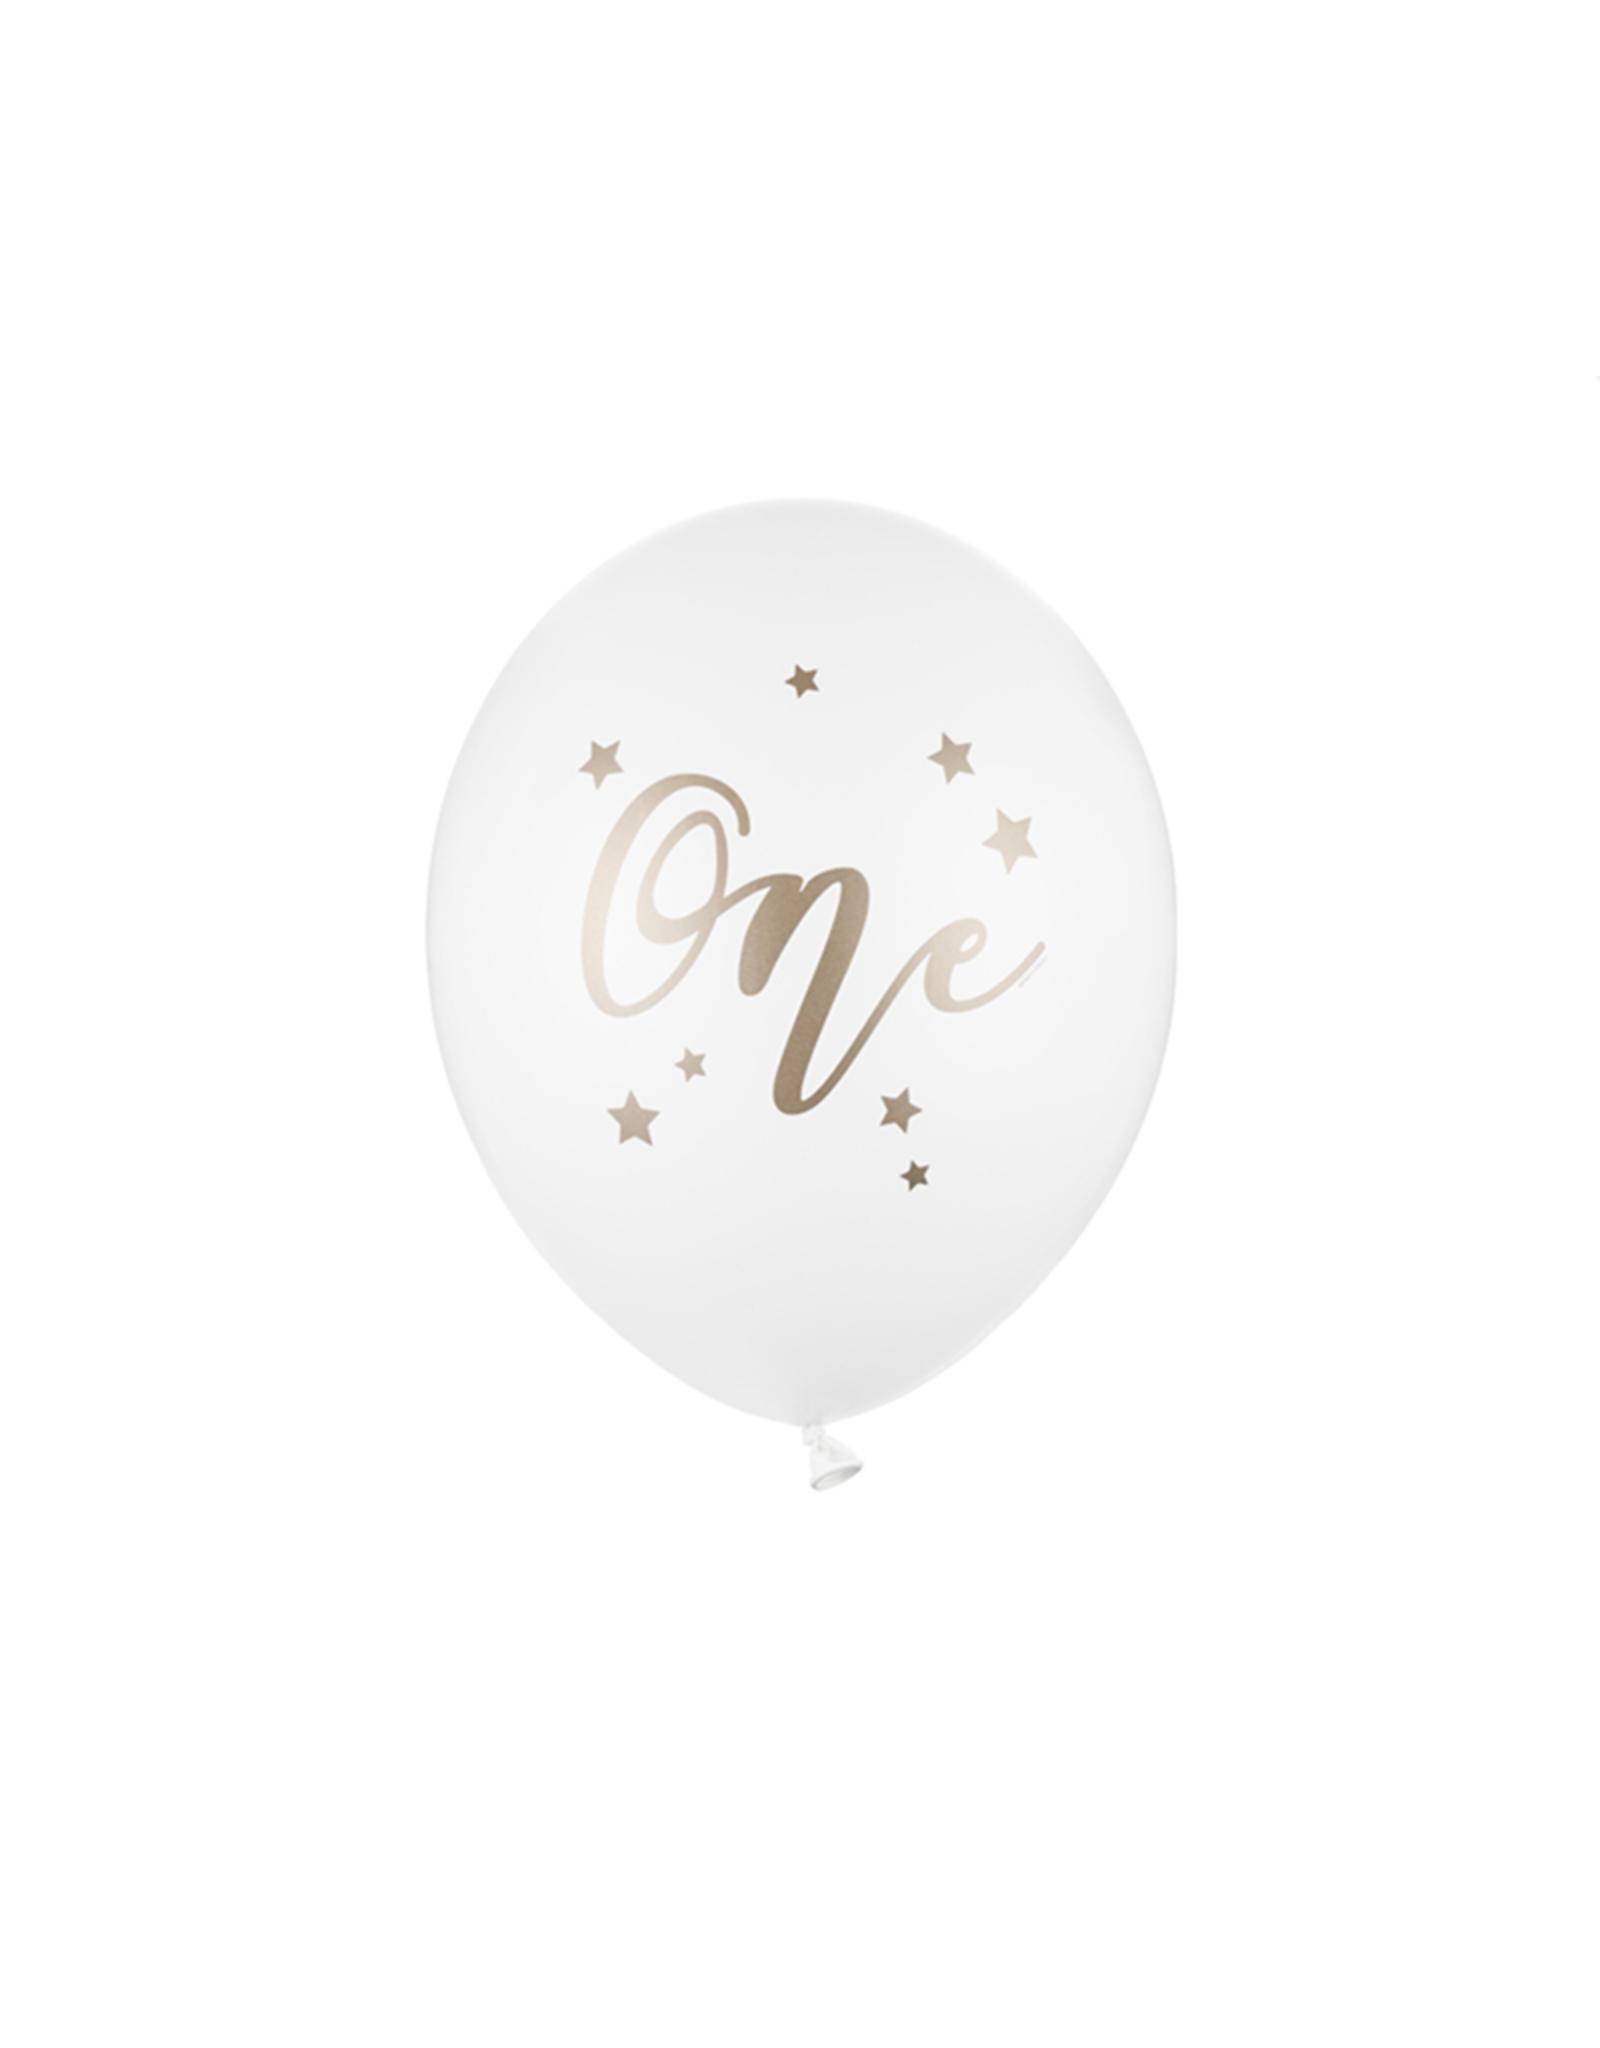 PartyDeco Ballonnen wit & goud 'One' | 5 stuks